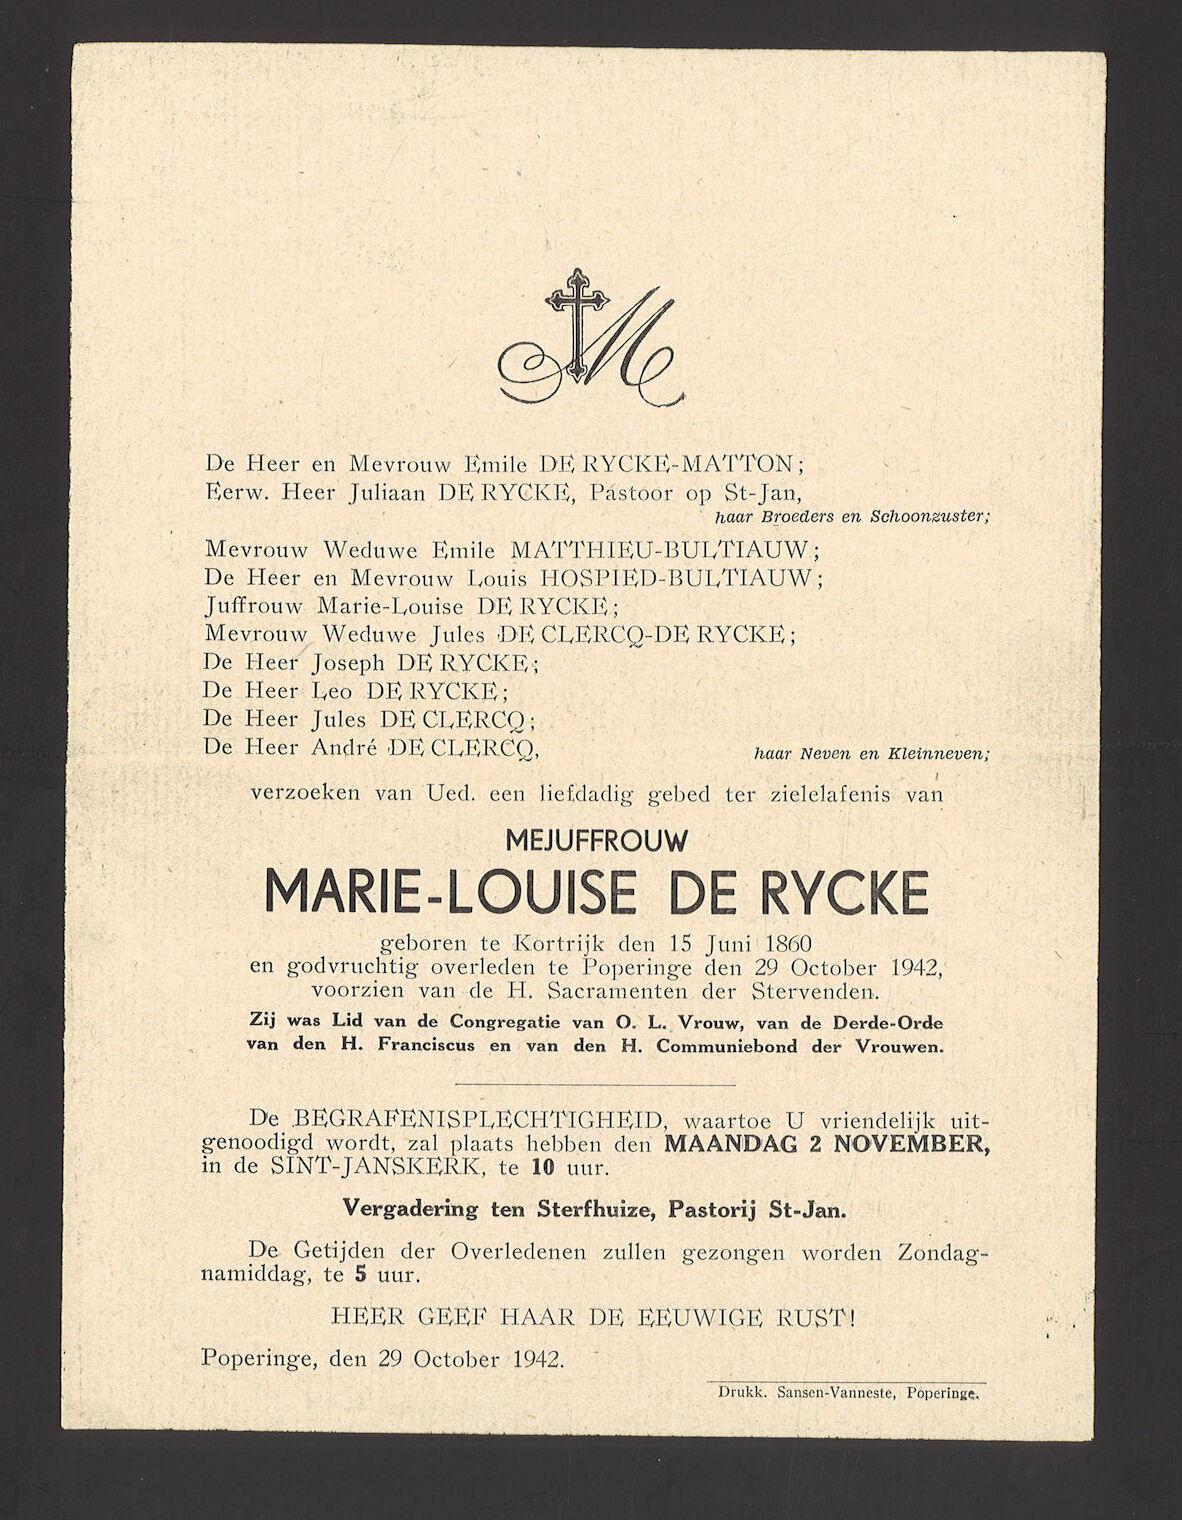 Marie-Louise De Rycke